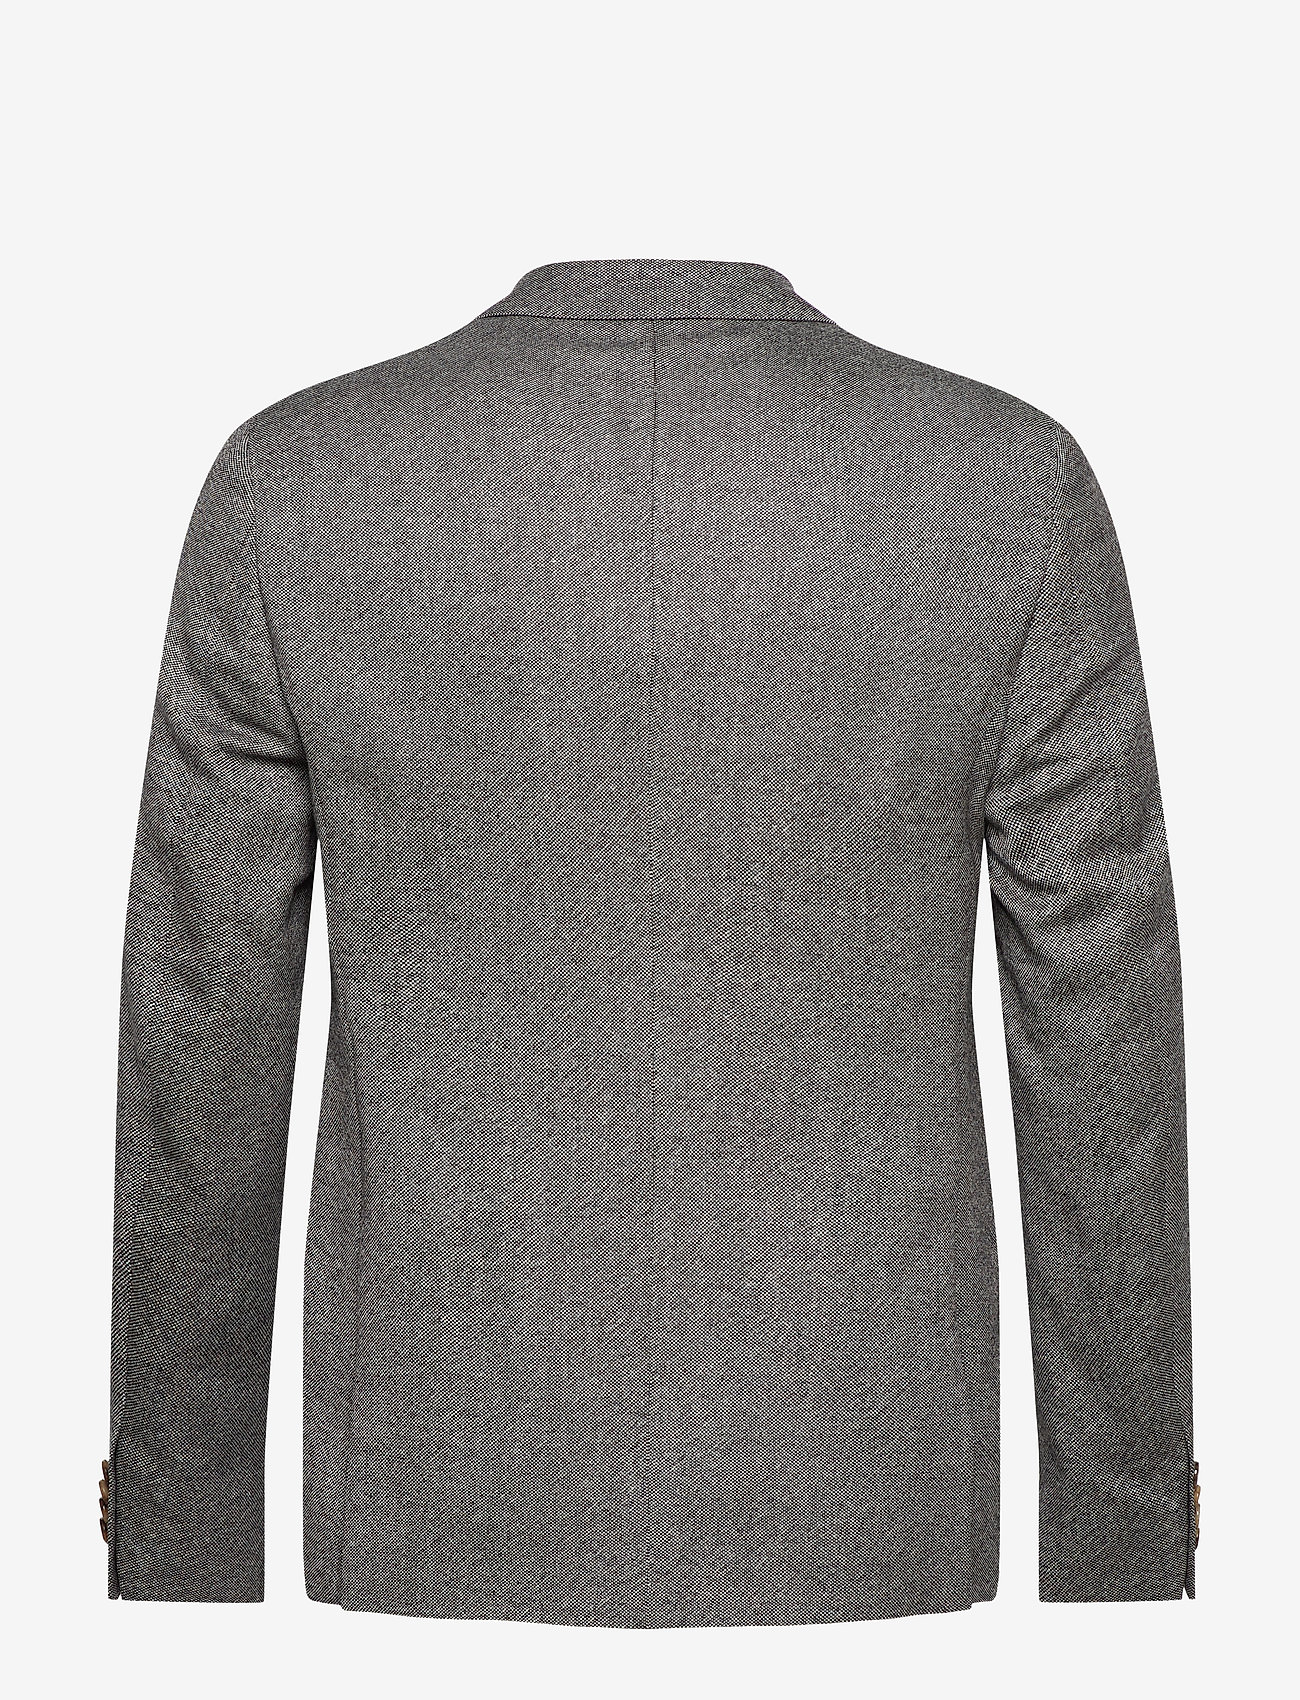 SAND - 6135 Oxford - Star Napoli Normal - blazers met enkele rij knopen - grey - 1